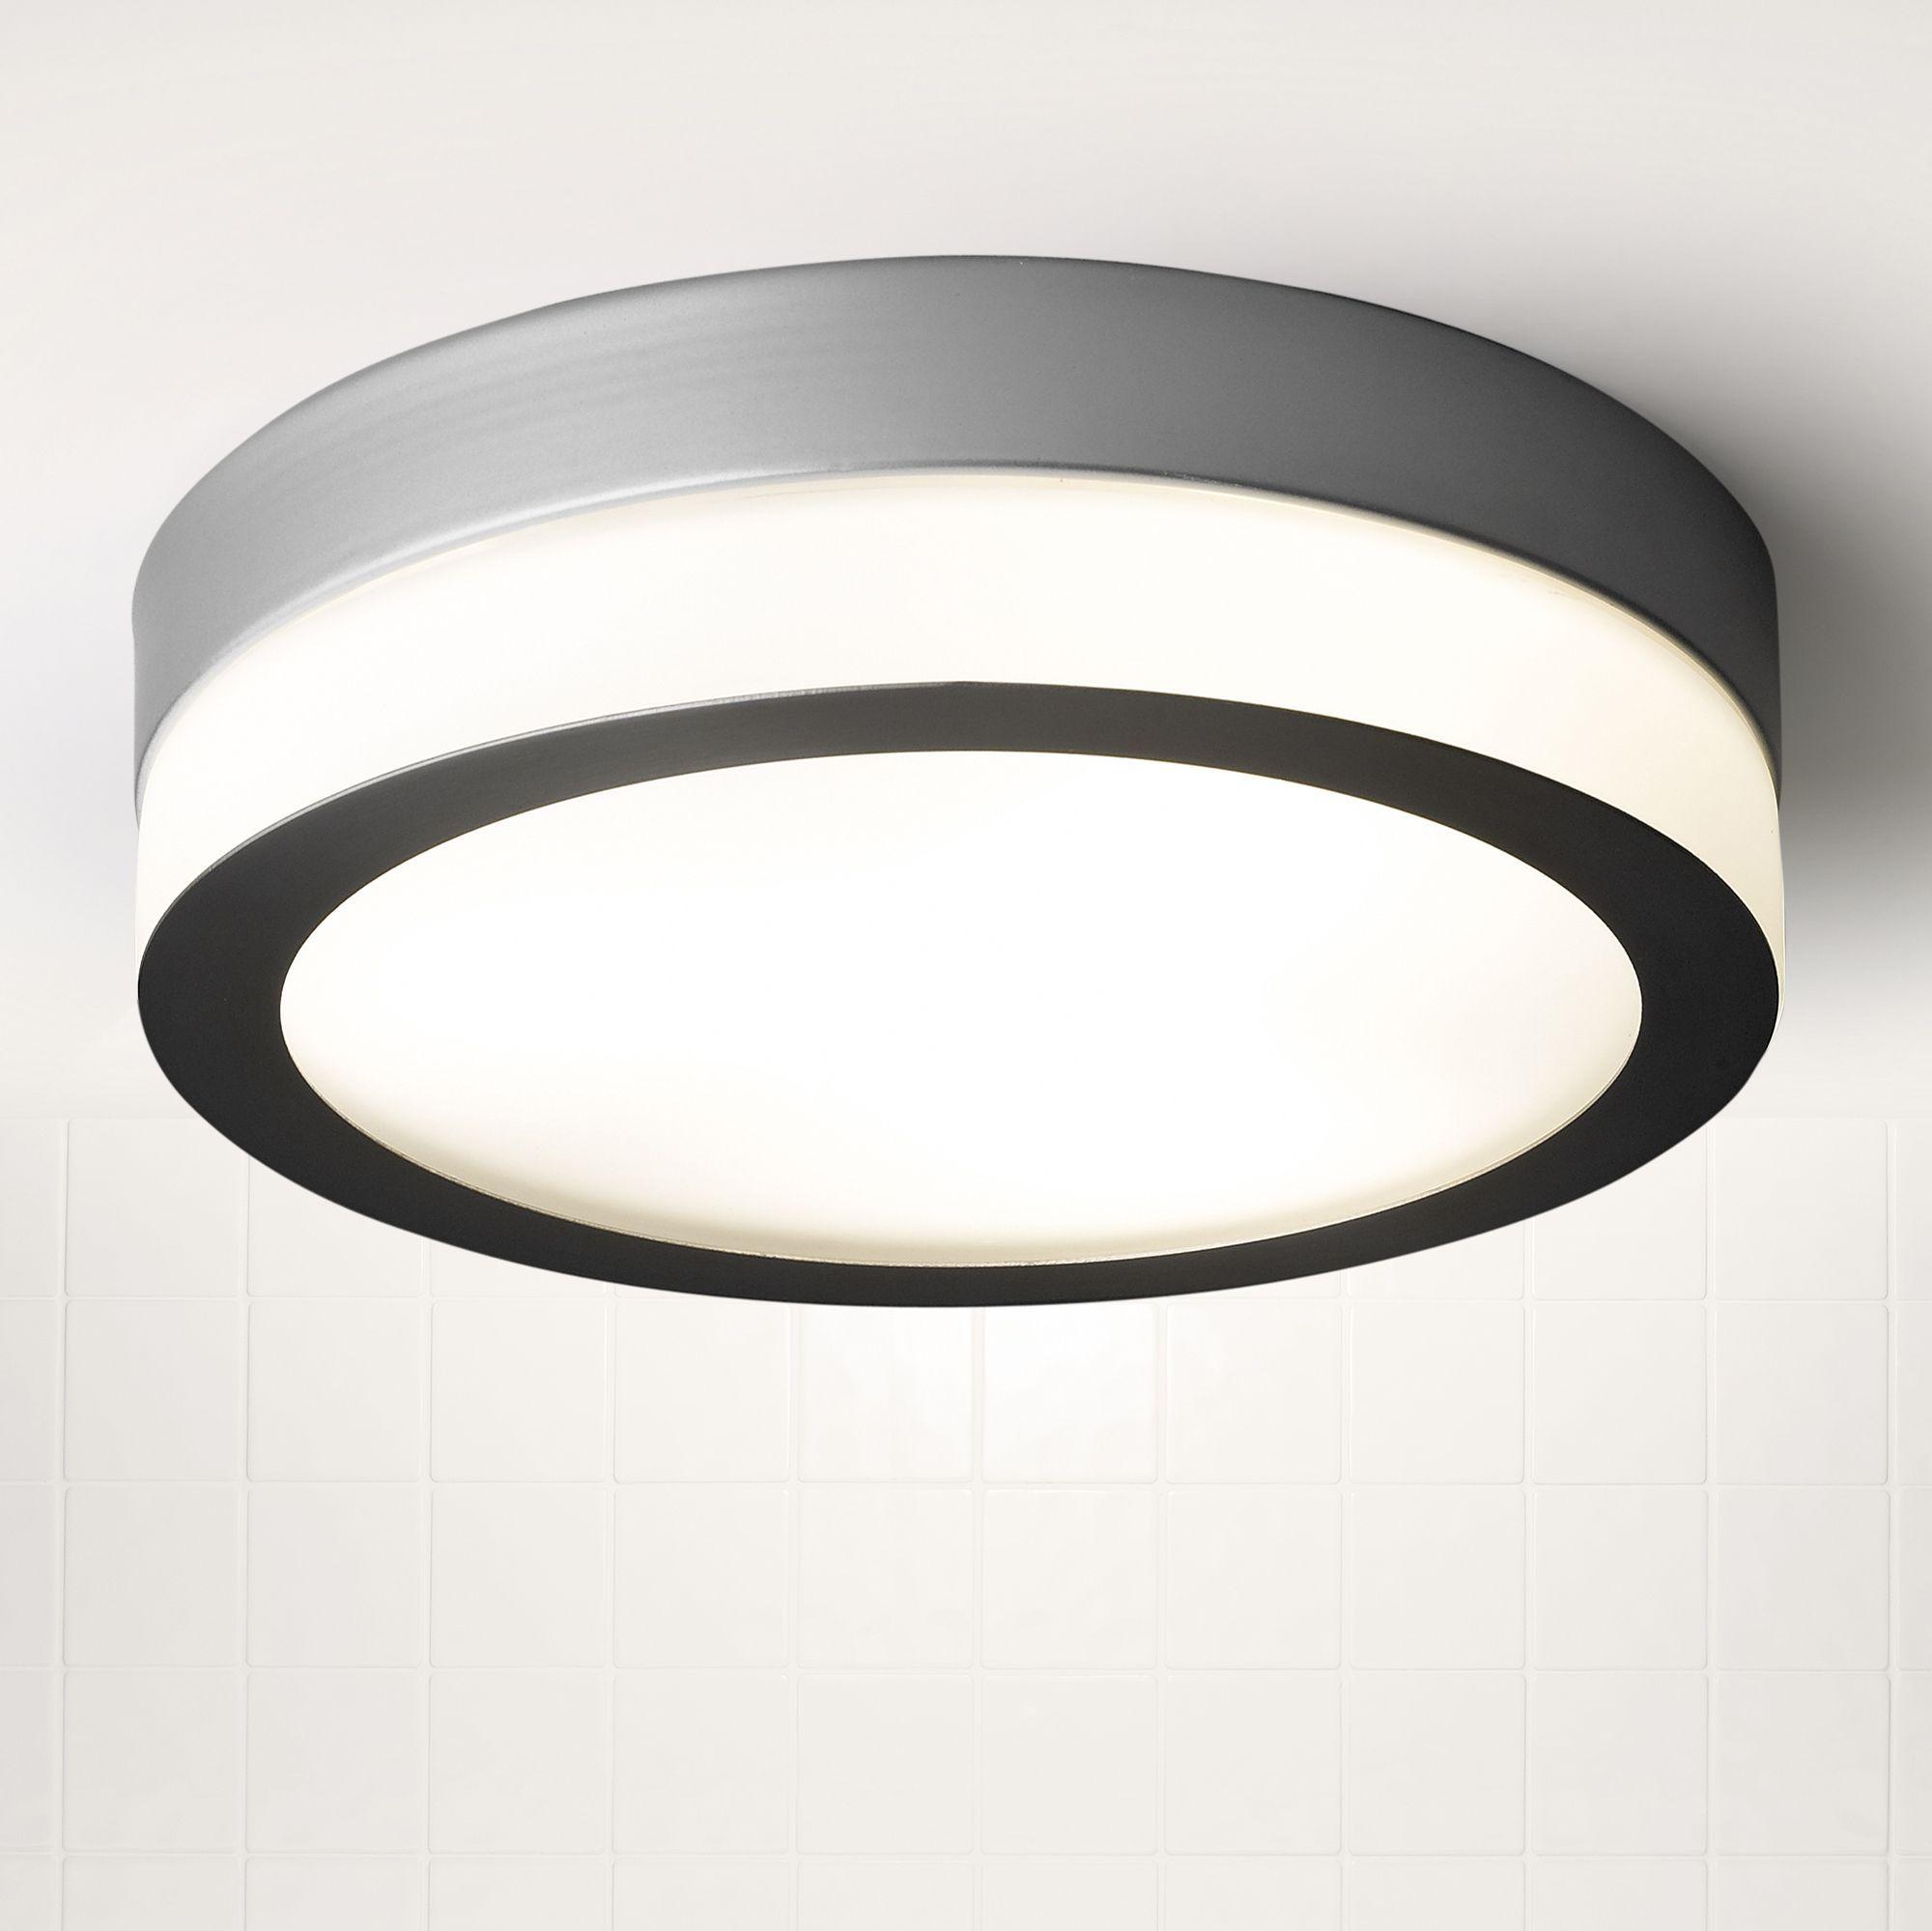 Bathroom Ceiling Lights At B&Q laguna silver satin chrome effect bathroom flush light